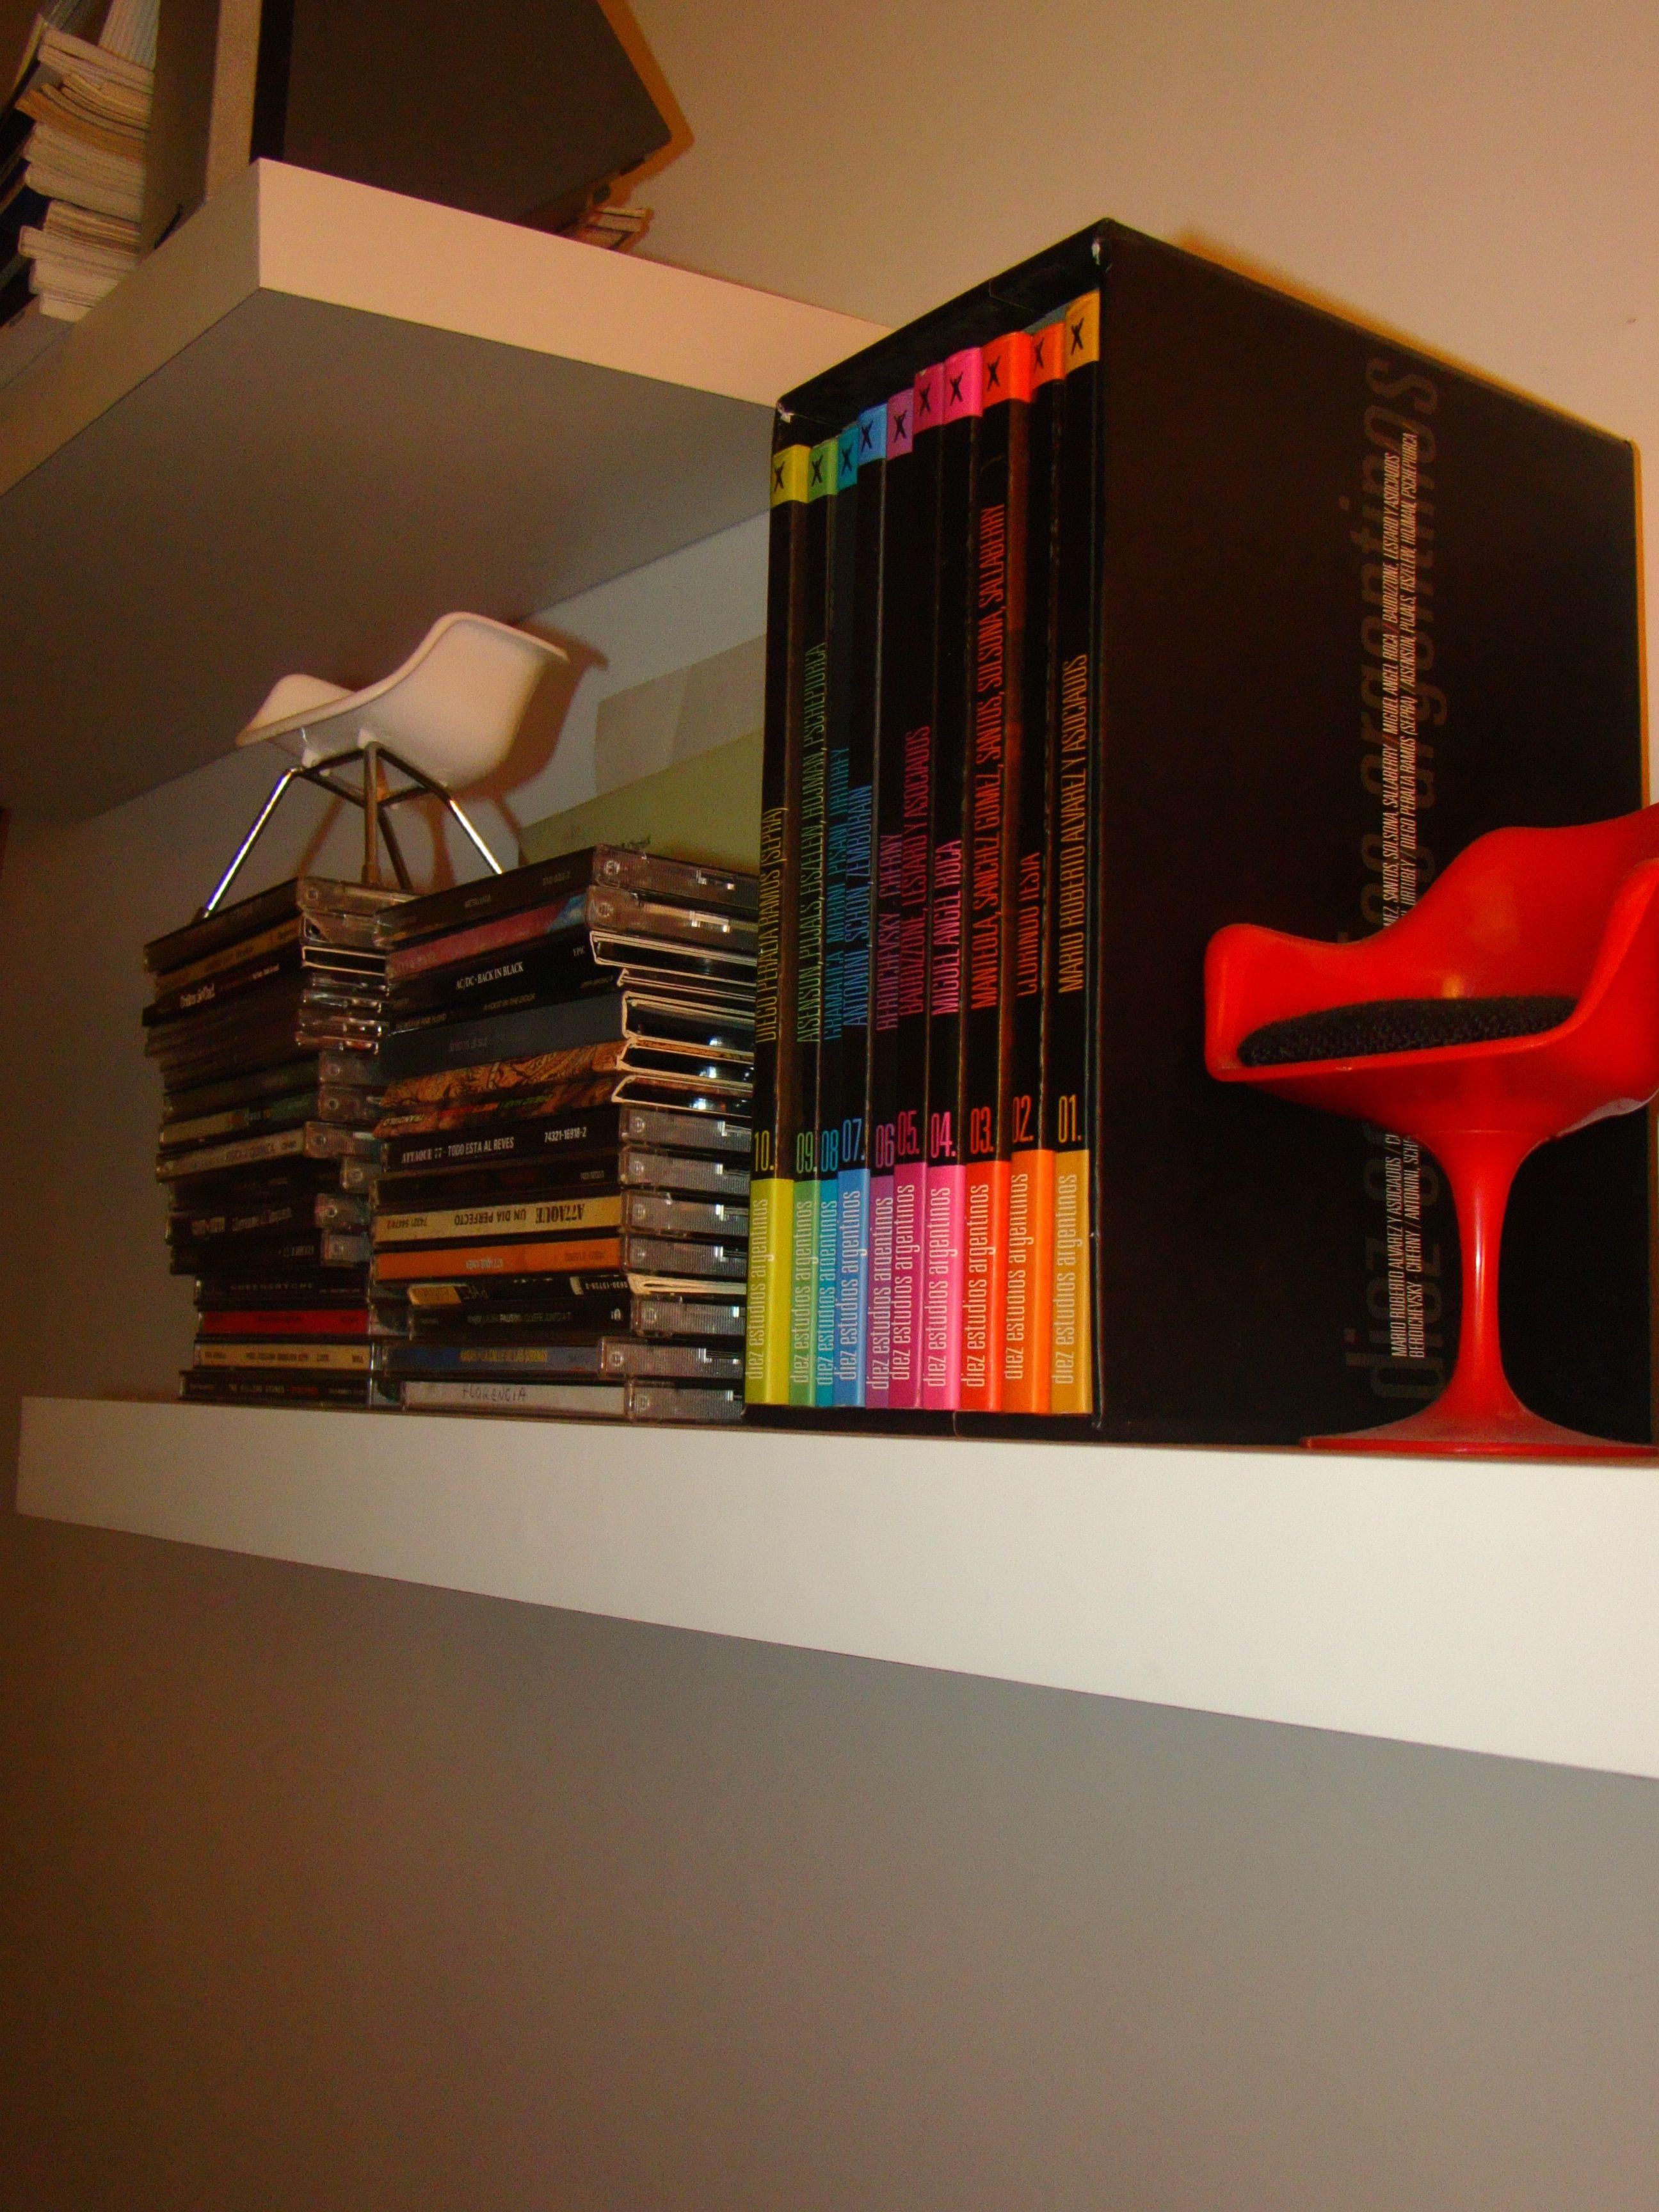 estantes con ménsula escondida, libros de arquitectura , cd y mini-sillas de diseño